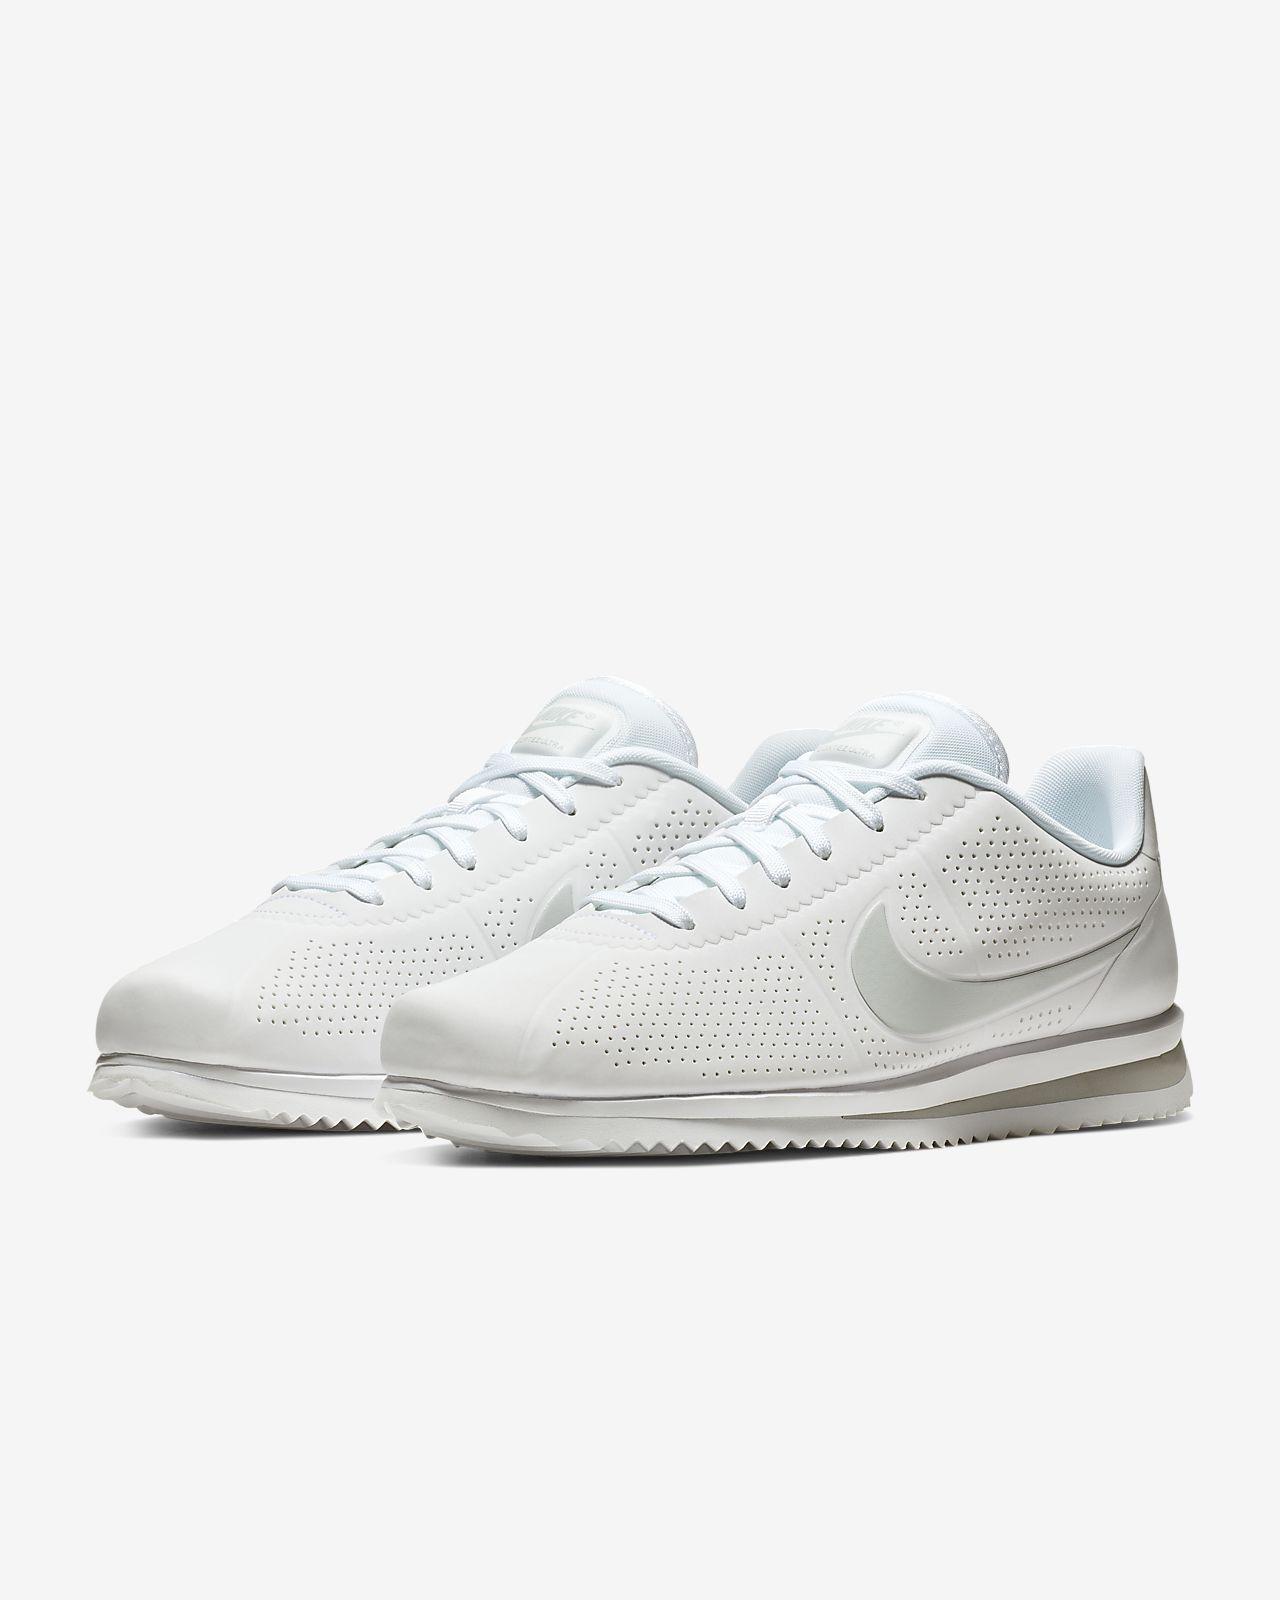 Zapatillas Casual Hombre Nike Cortez Ultra Moire 2 – Tienda